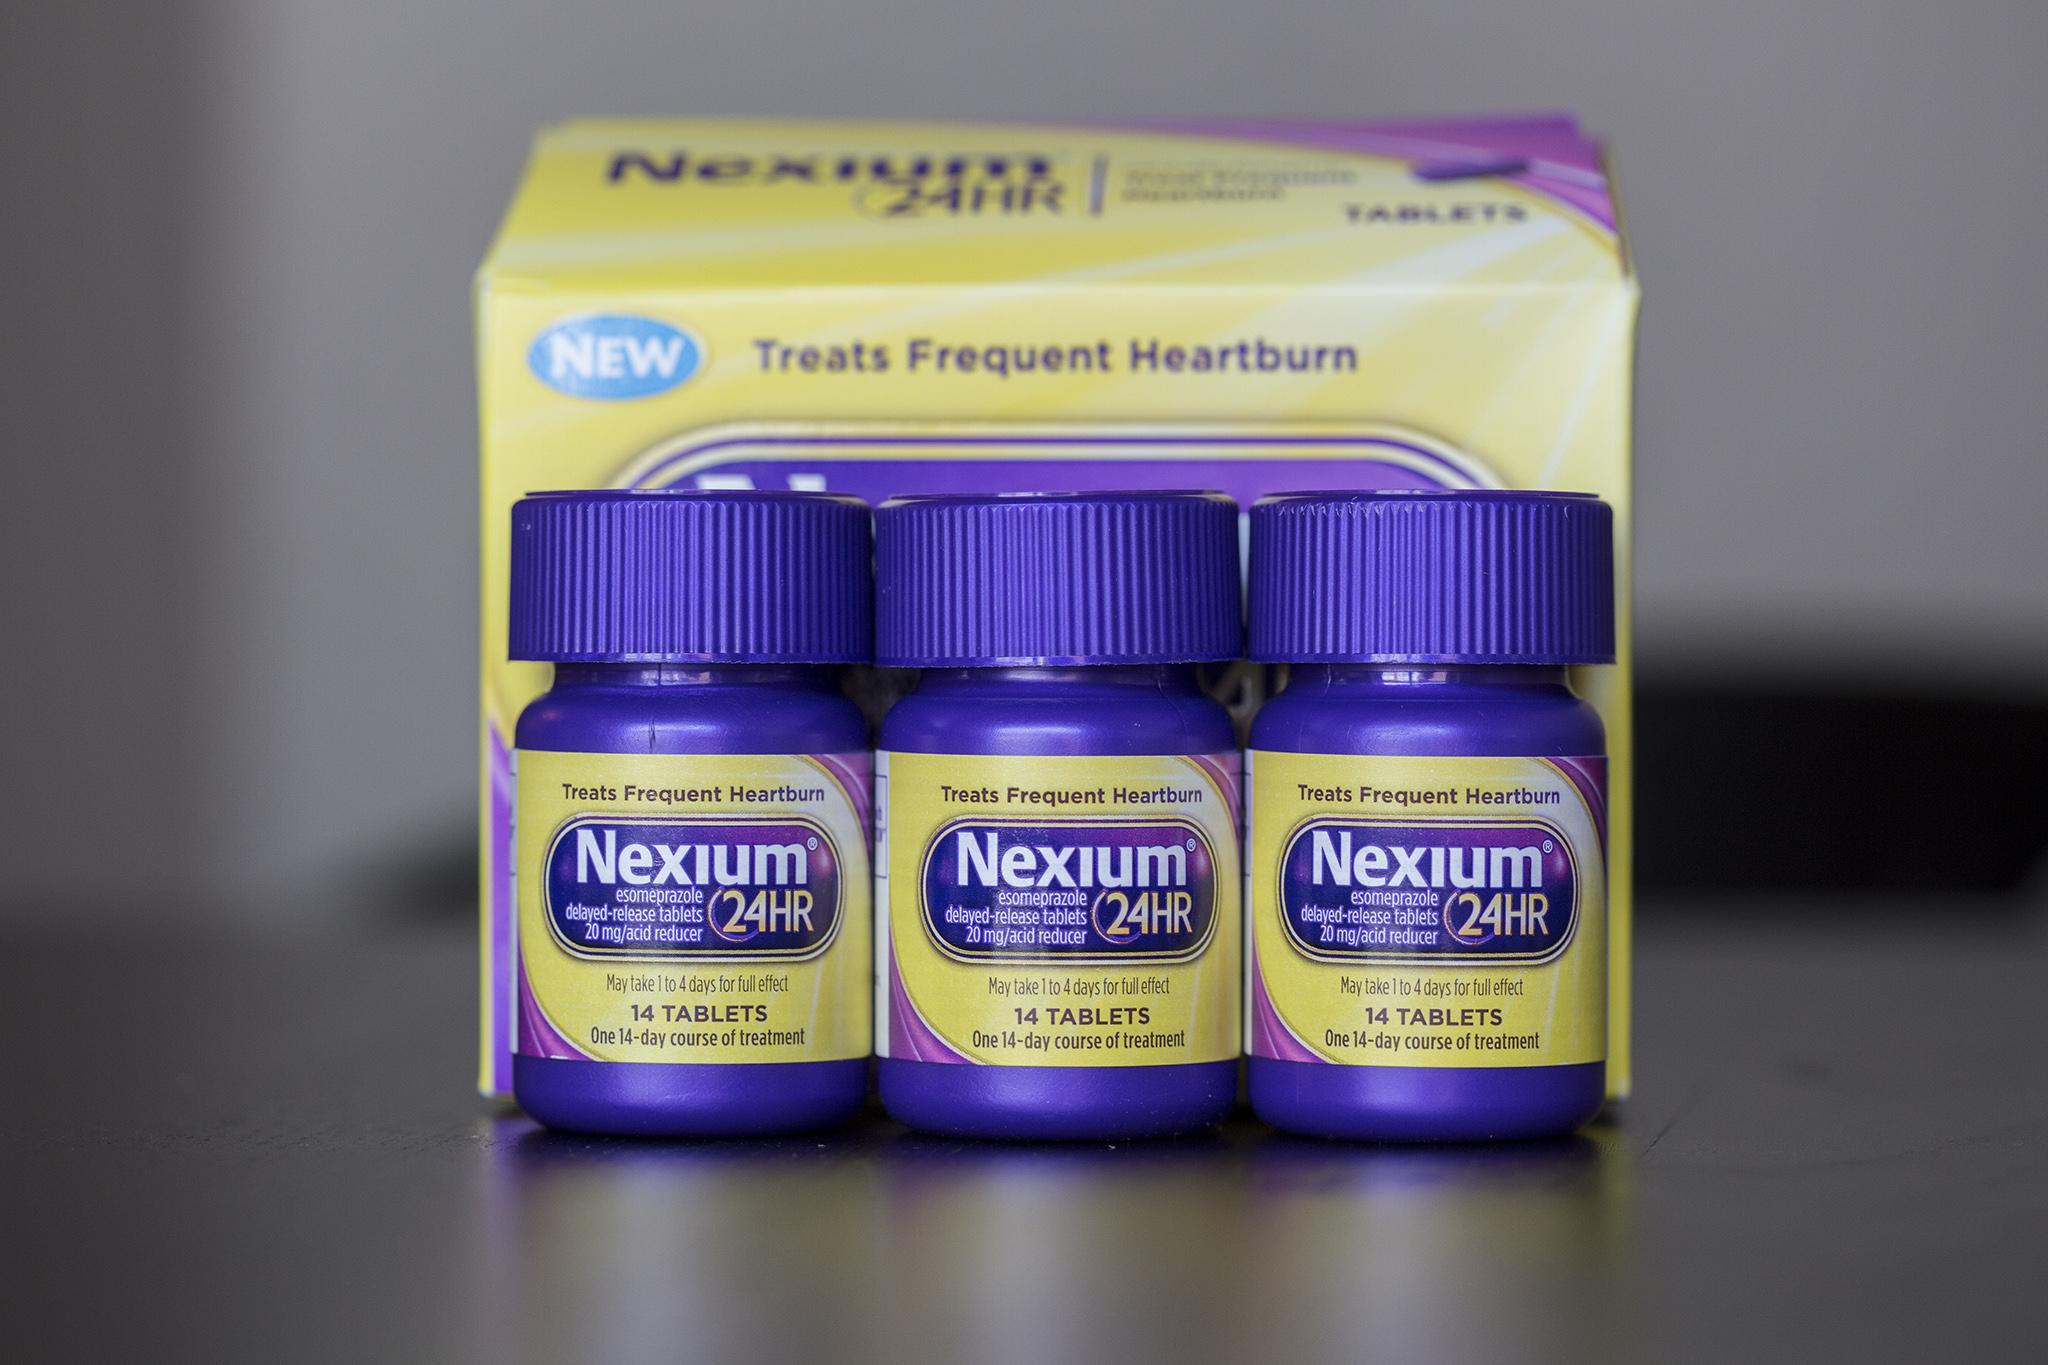 How to beat heartburn with Nexium - pepperoni pizza bites